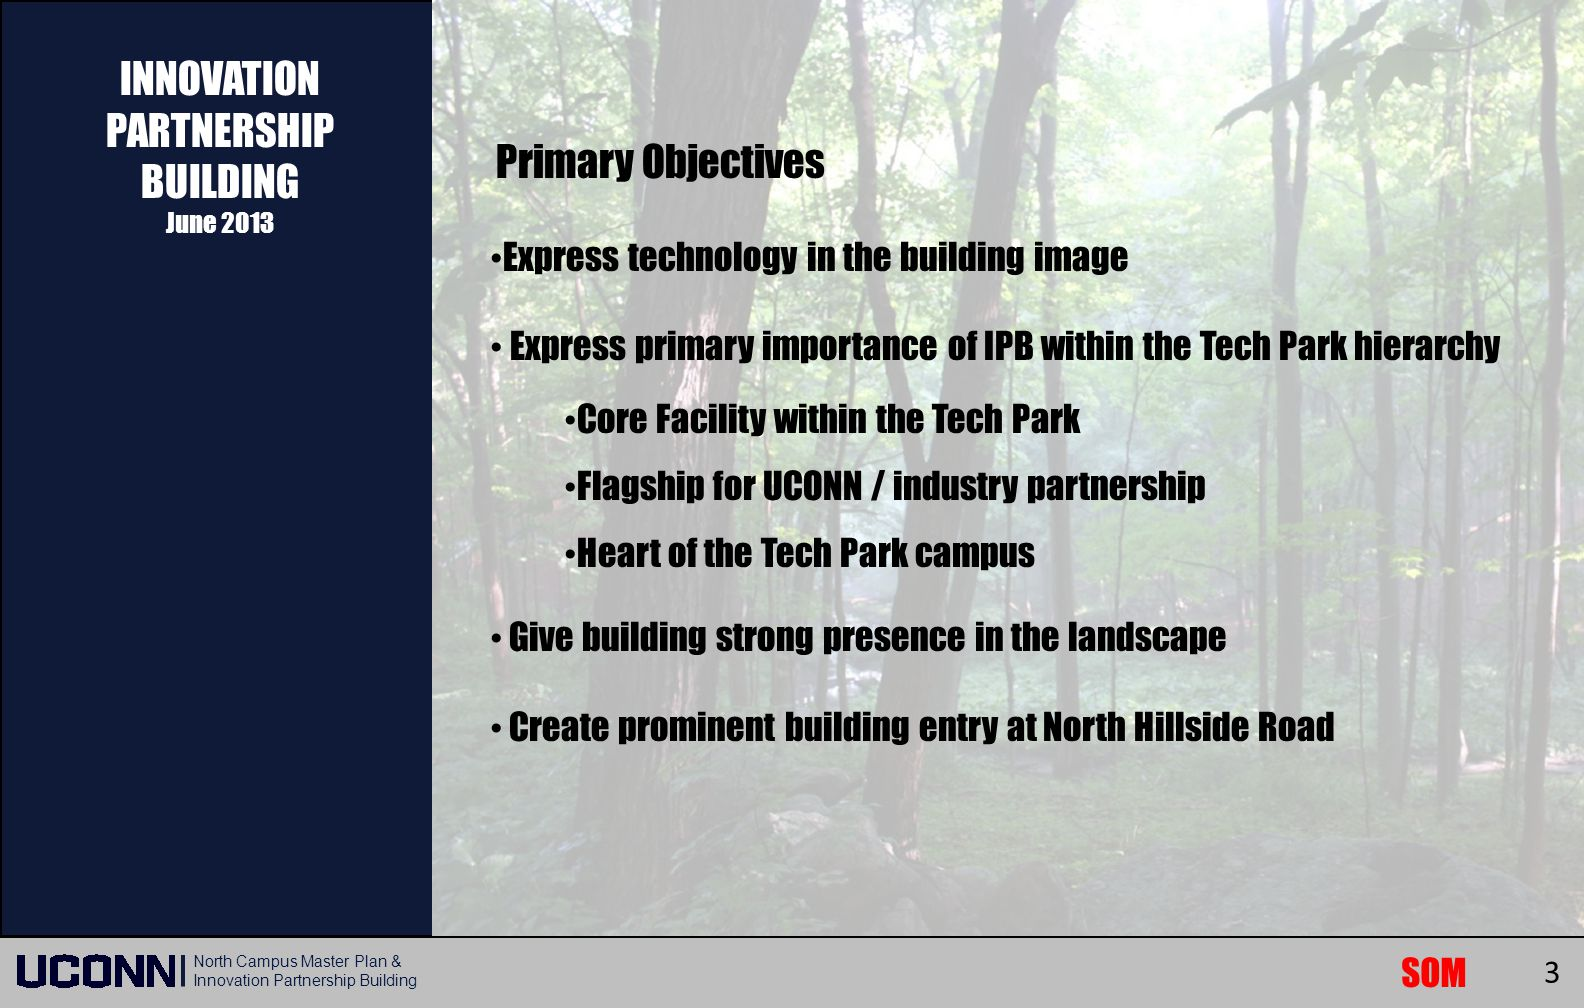 INNOVATION PARTNERSHIP BUILDING Primary Objectives